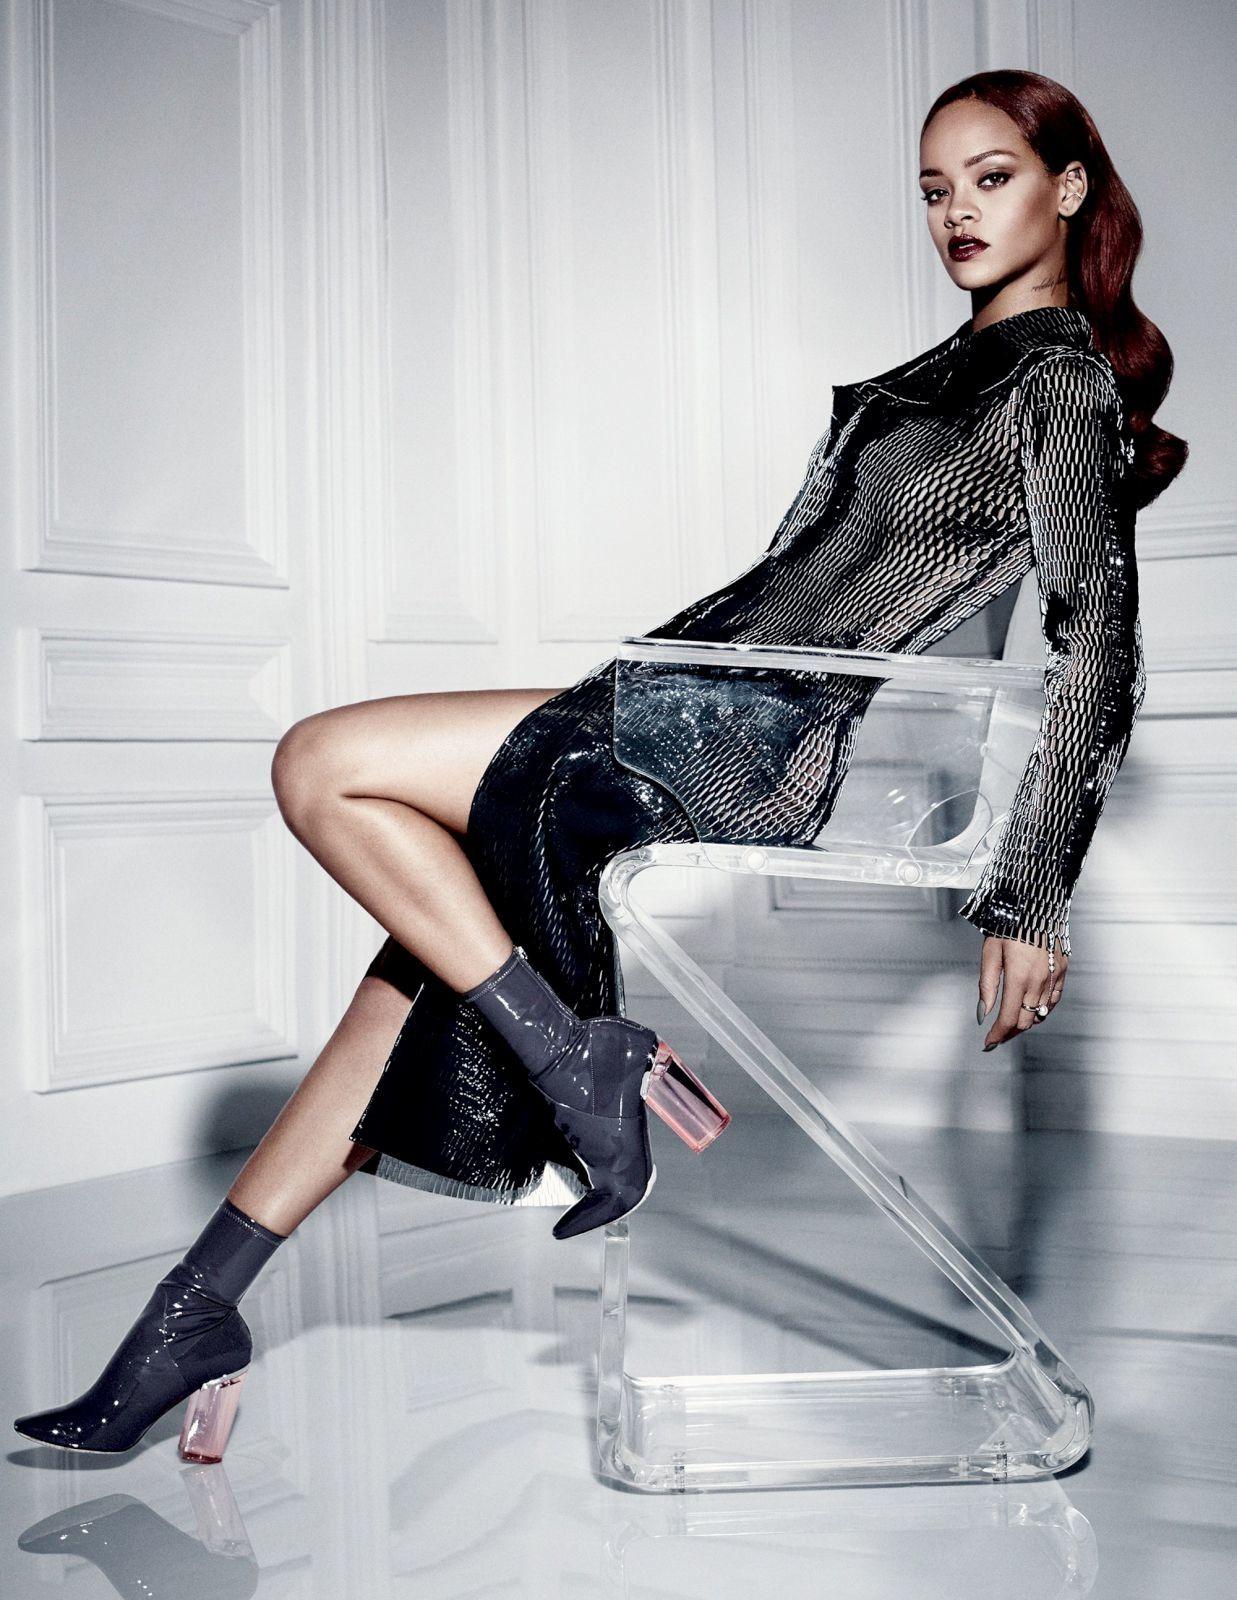 Rihanna-Dior-Magazine-Photoshoot-3   Chocolate City   Pinterest ... 625fbff9bec